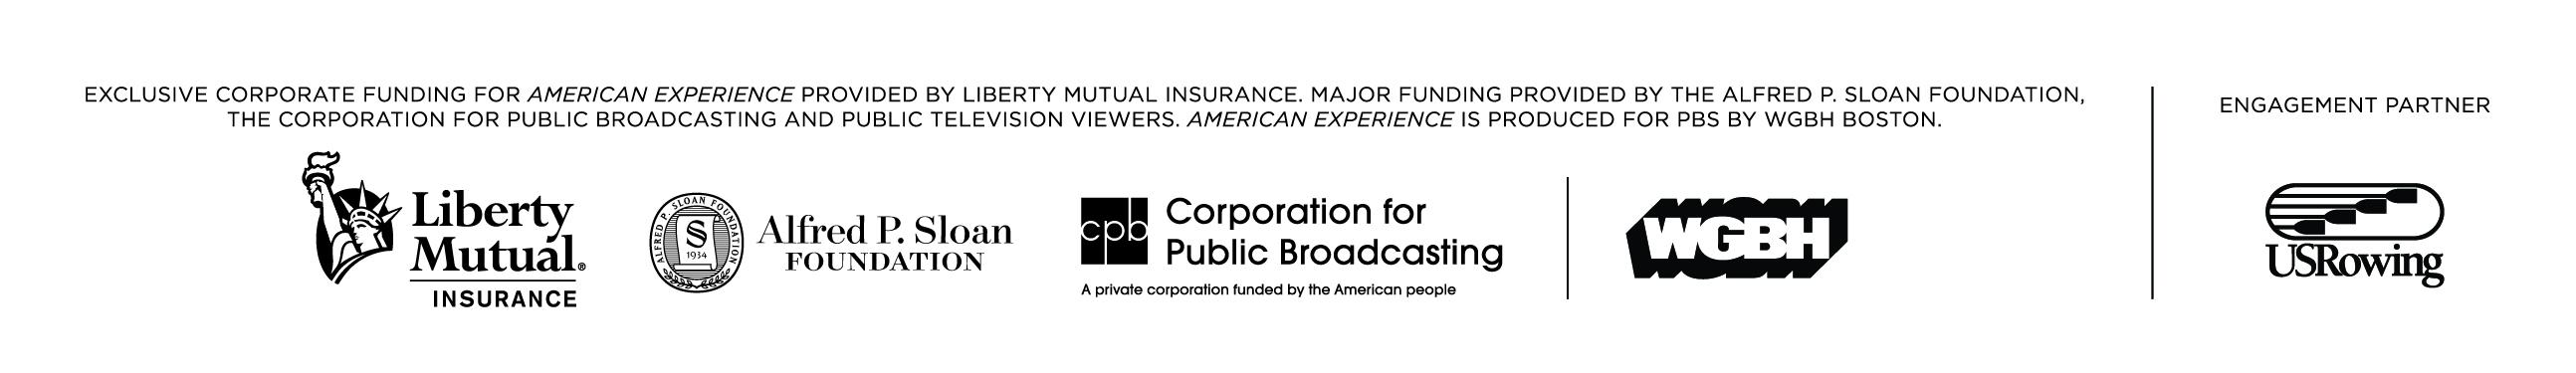 American Experience Funders